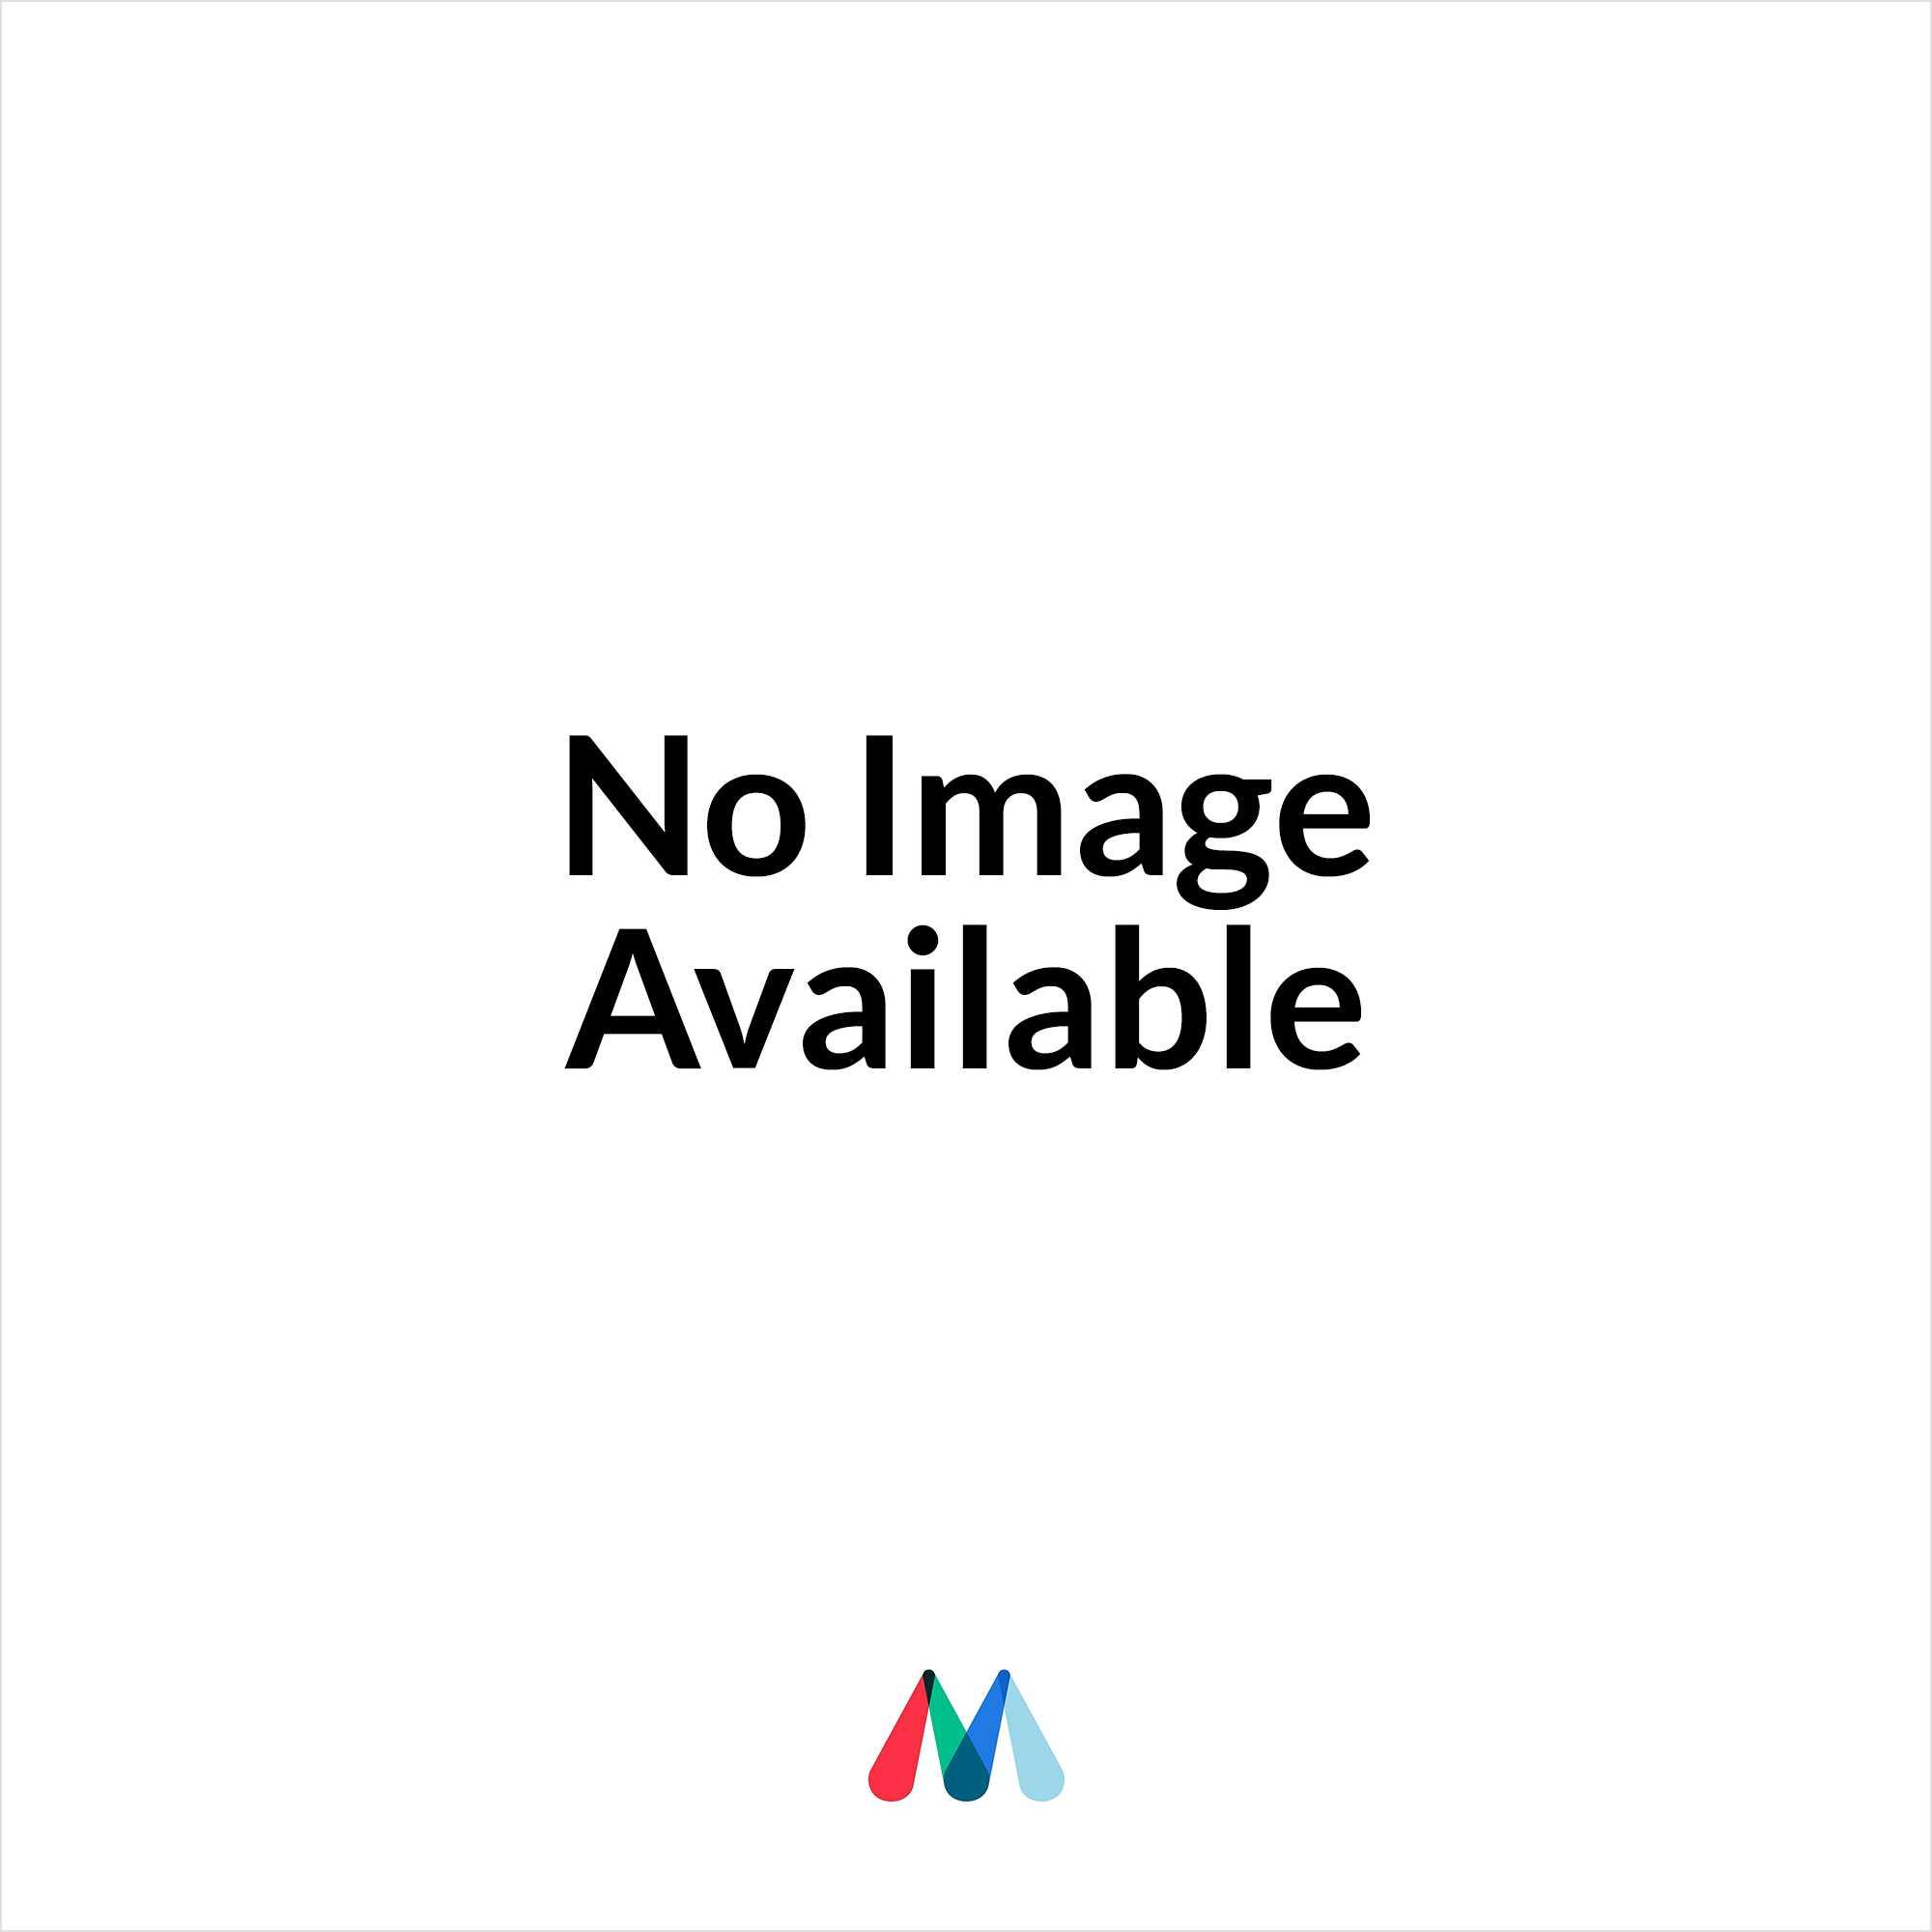 Collingwood Lighting WL341 Asymmetric mains cast finish step light - Stainless steel